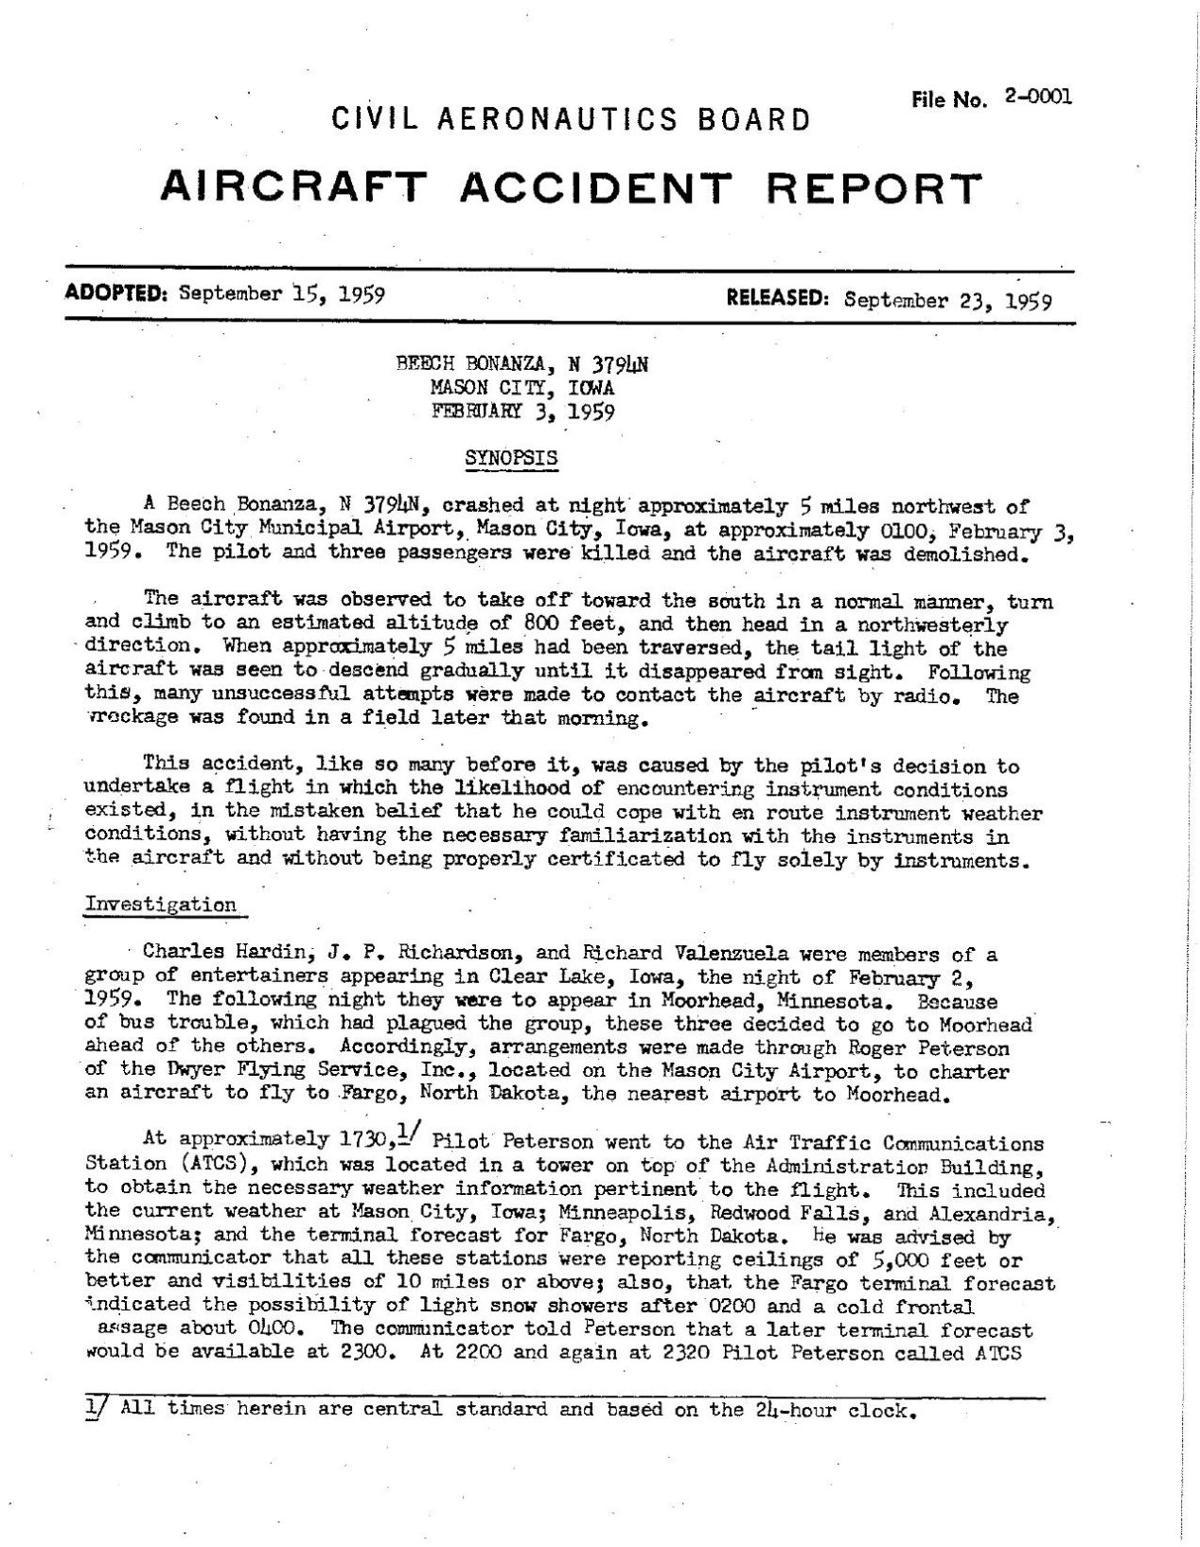 Civil Aeronautics Board Report Sept. 23, 1959